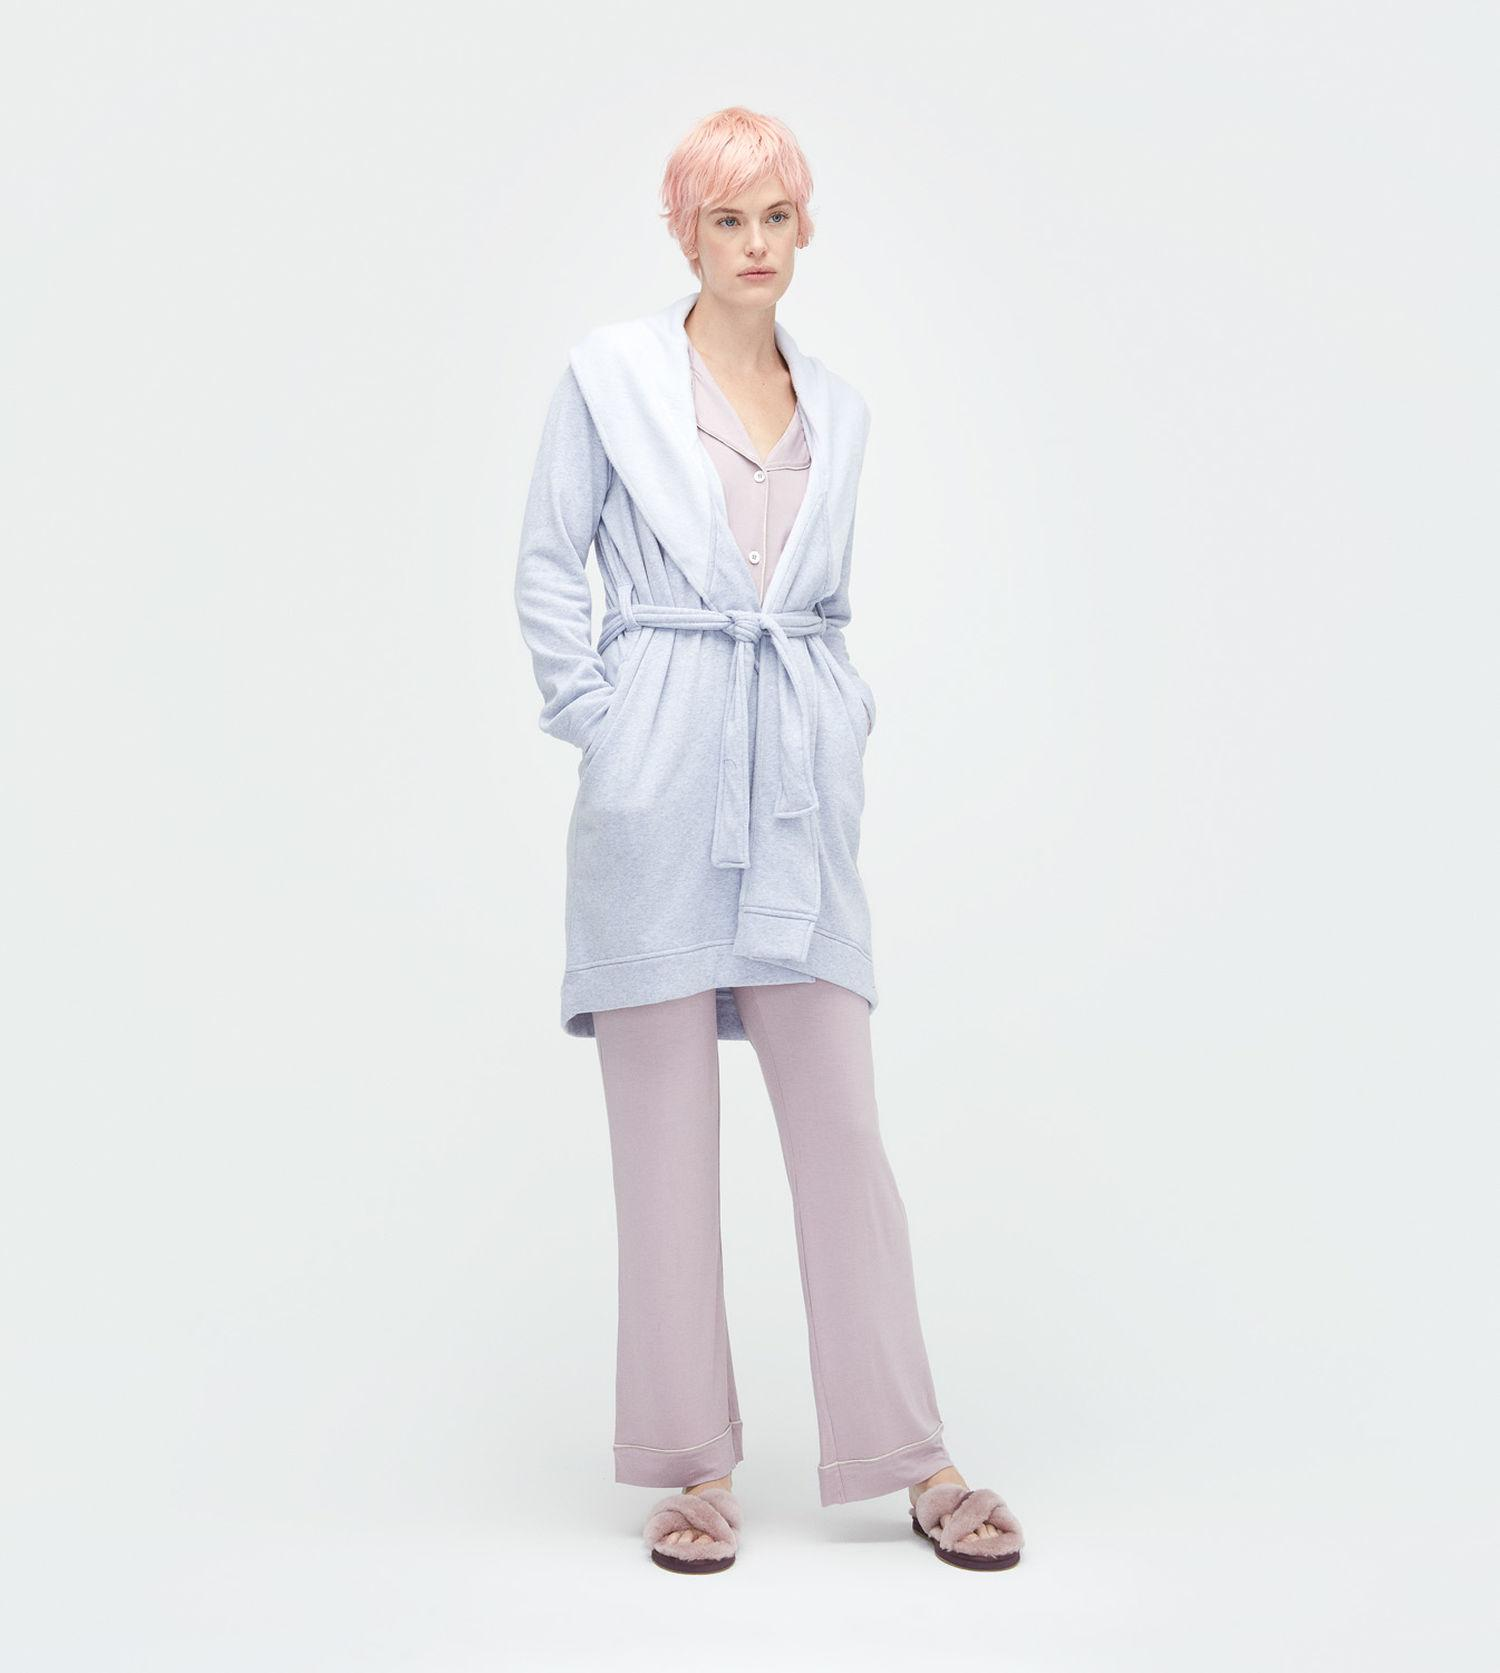 c08d324867 Lyst - Ugg Women s Blanche Robe in Blue